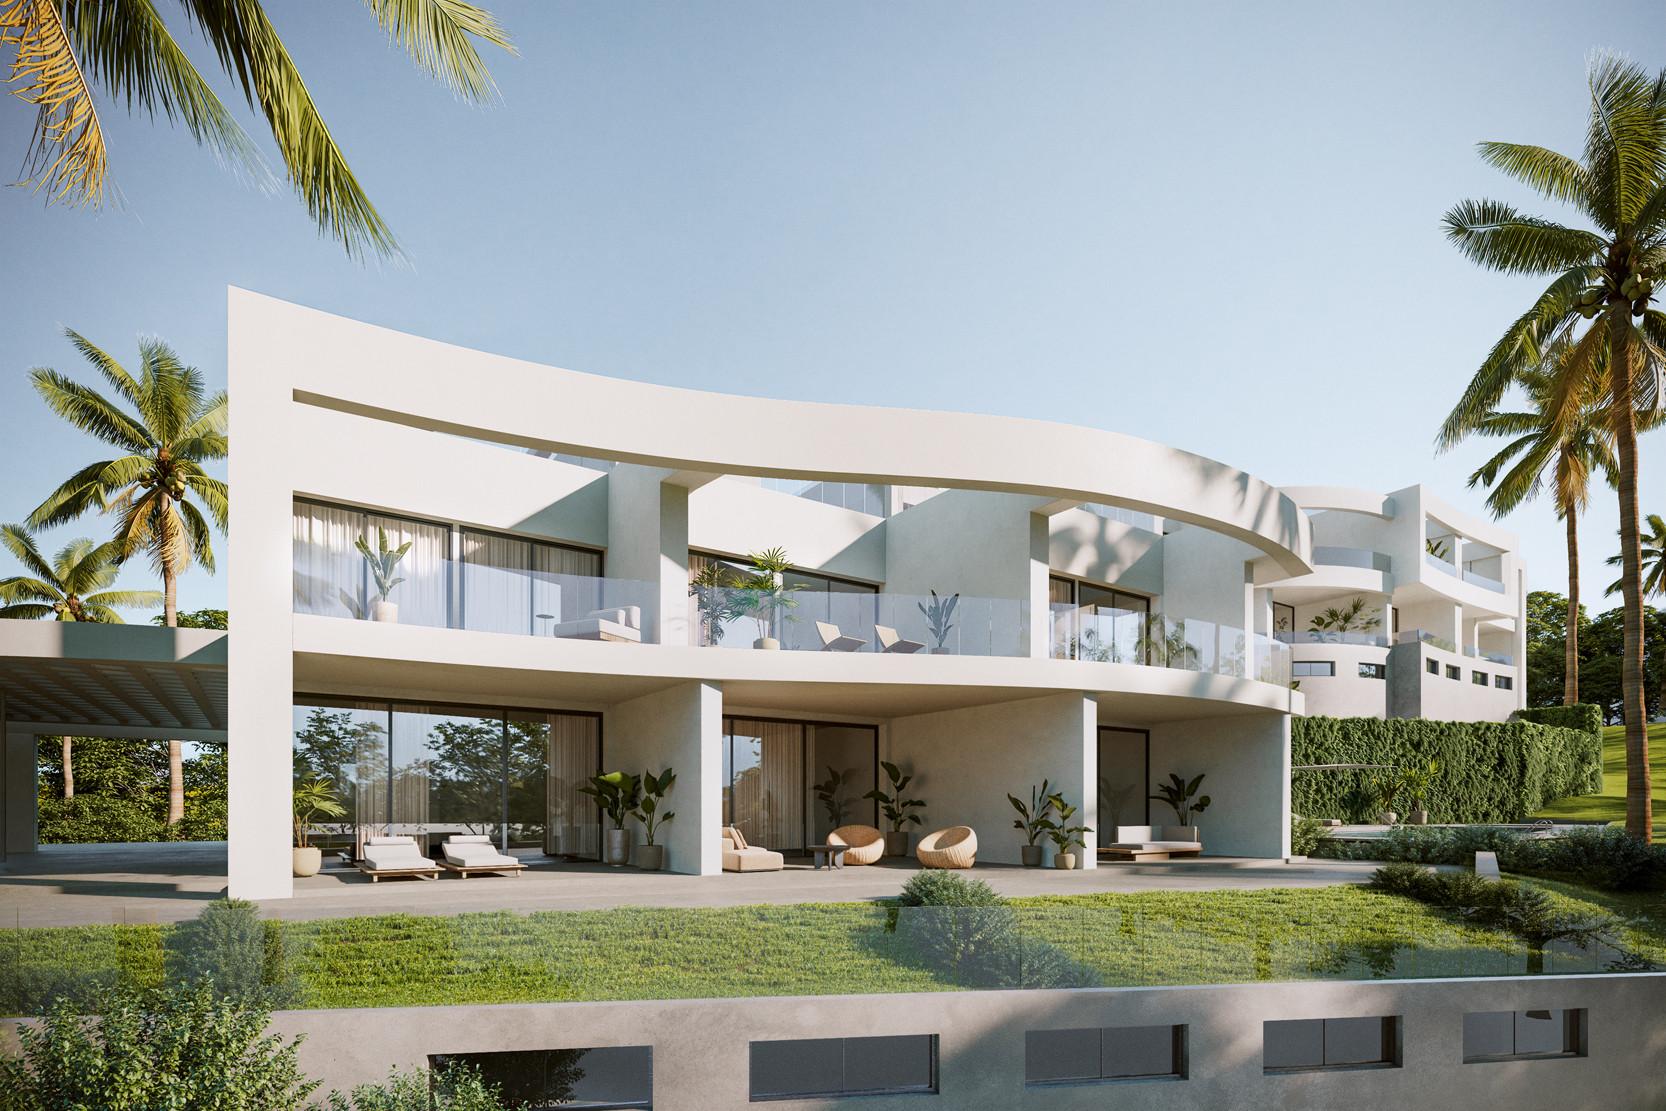 Town House in Riviera del Sol